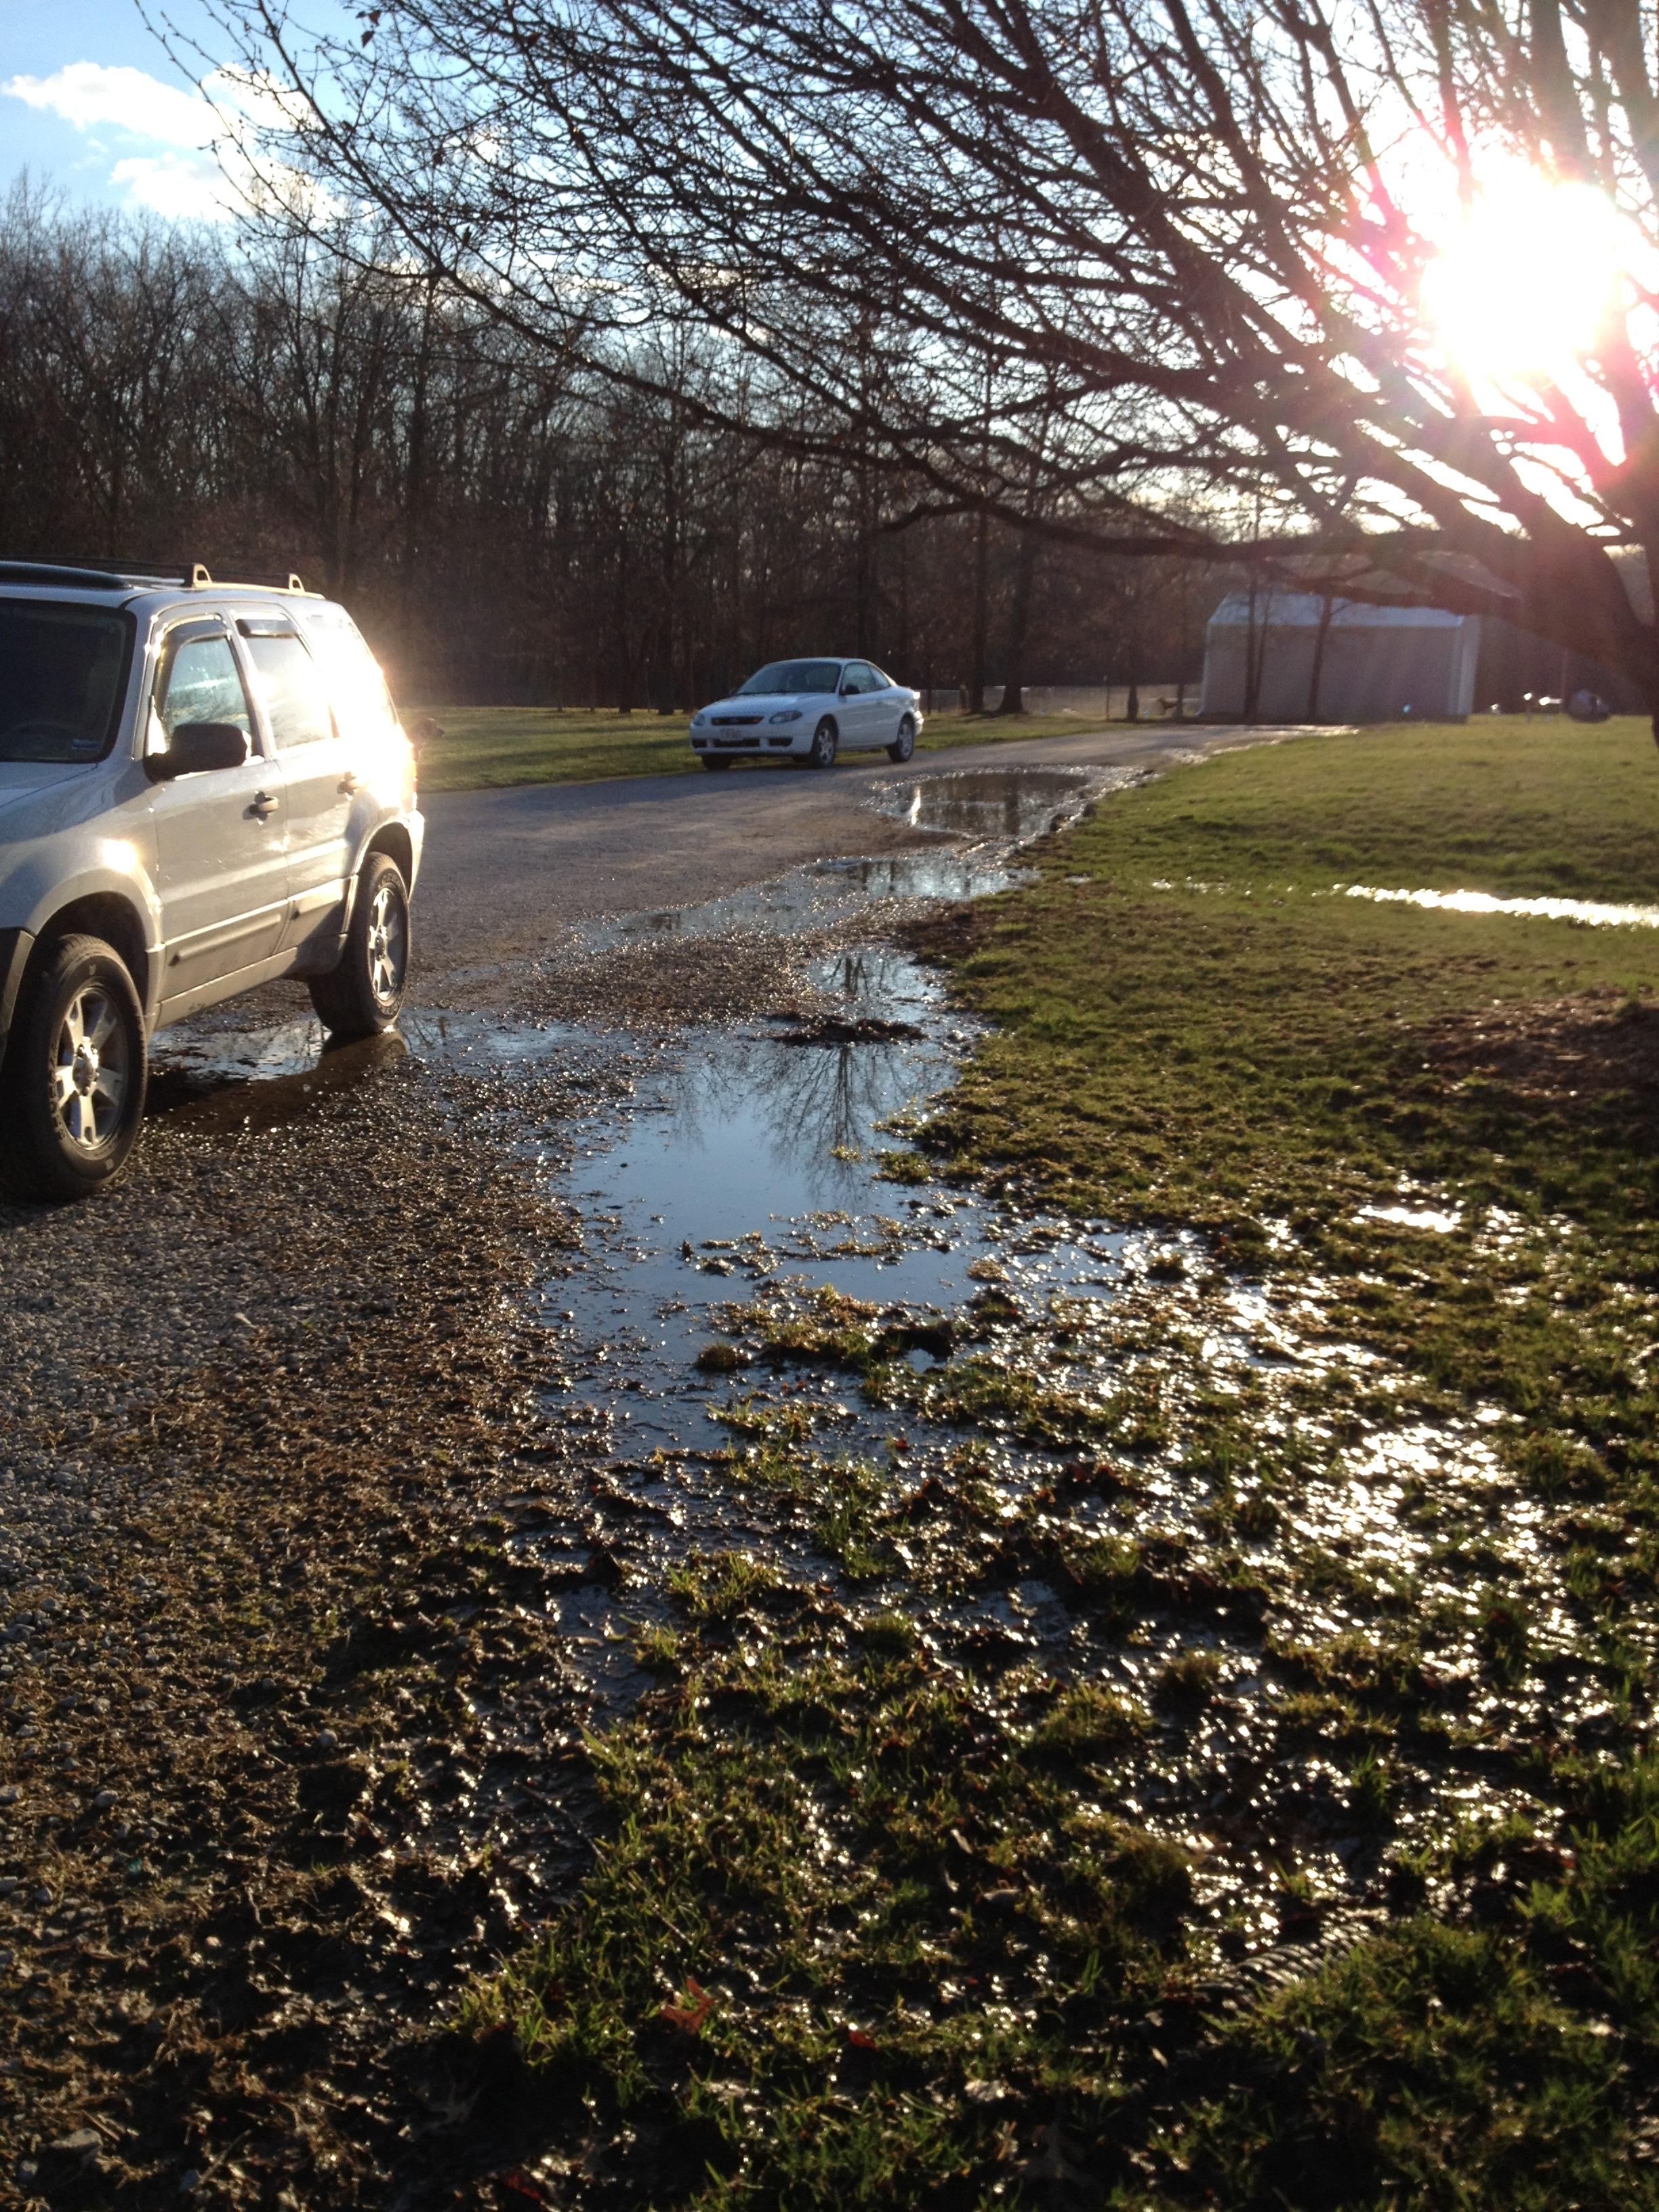 Driveway moat